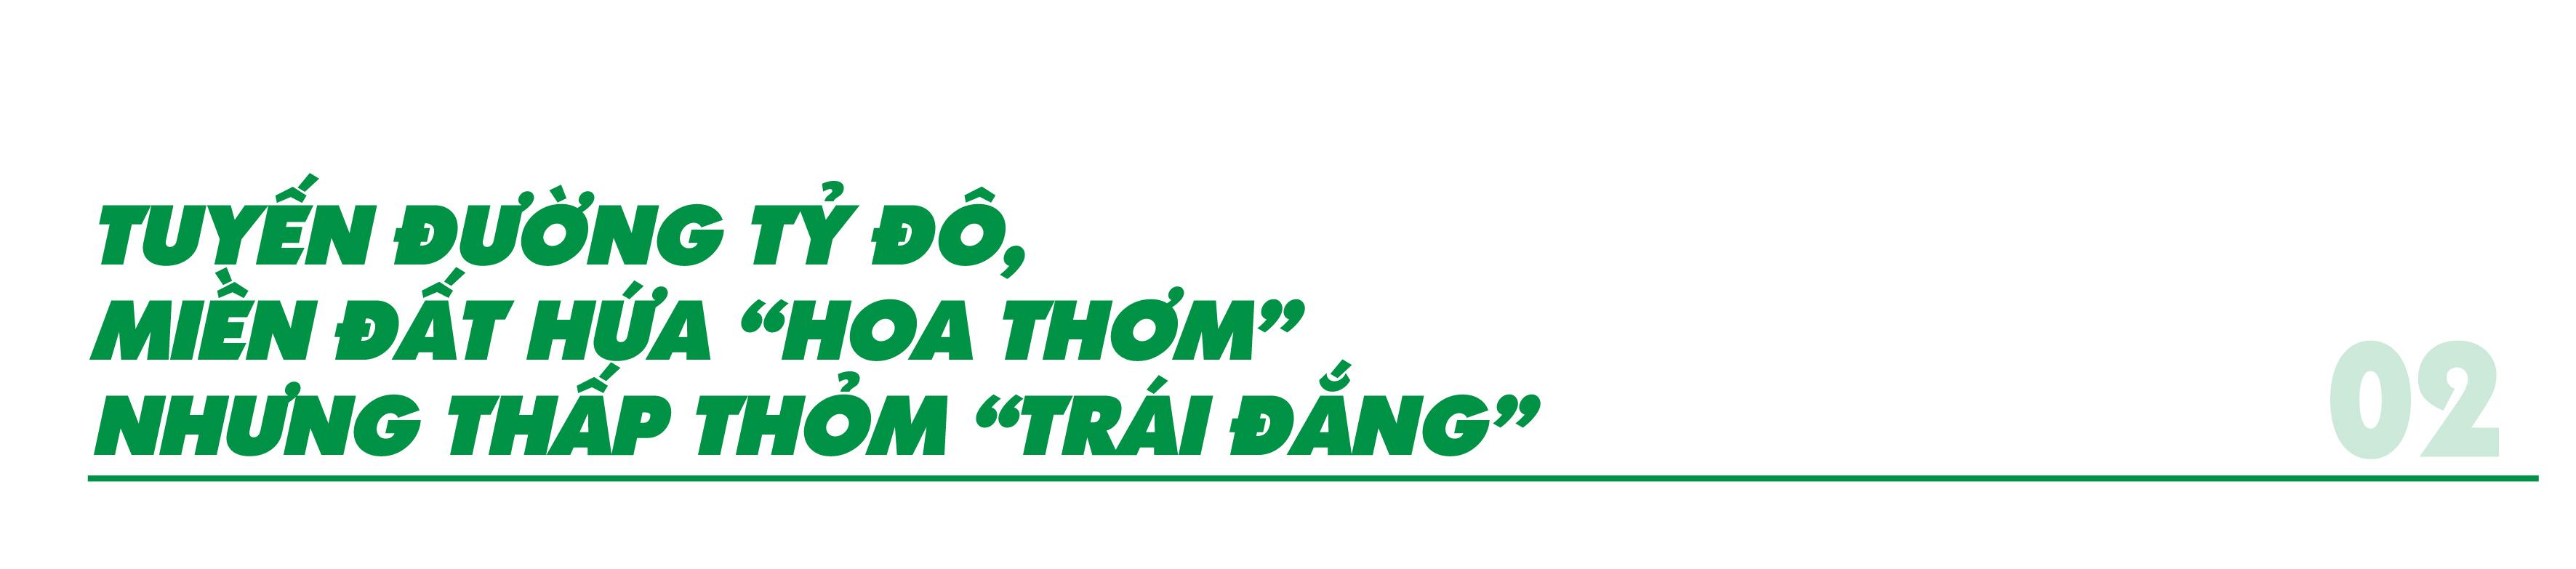 bat-dong-san-thai-nguyen02